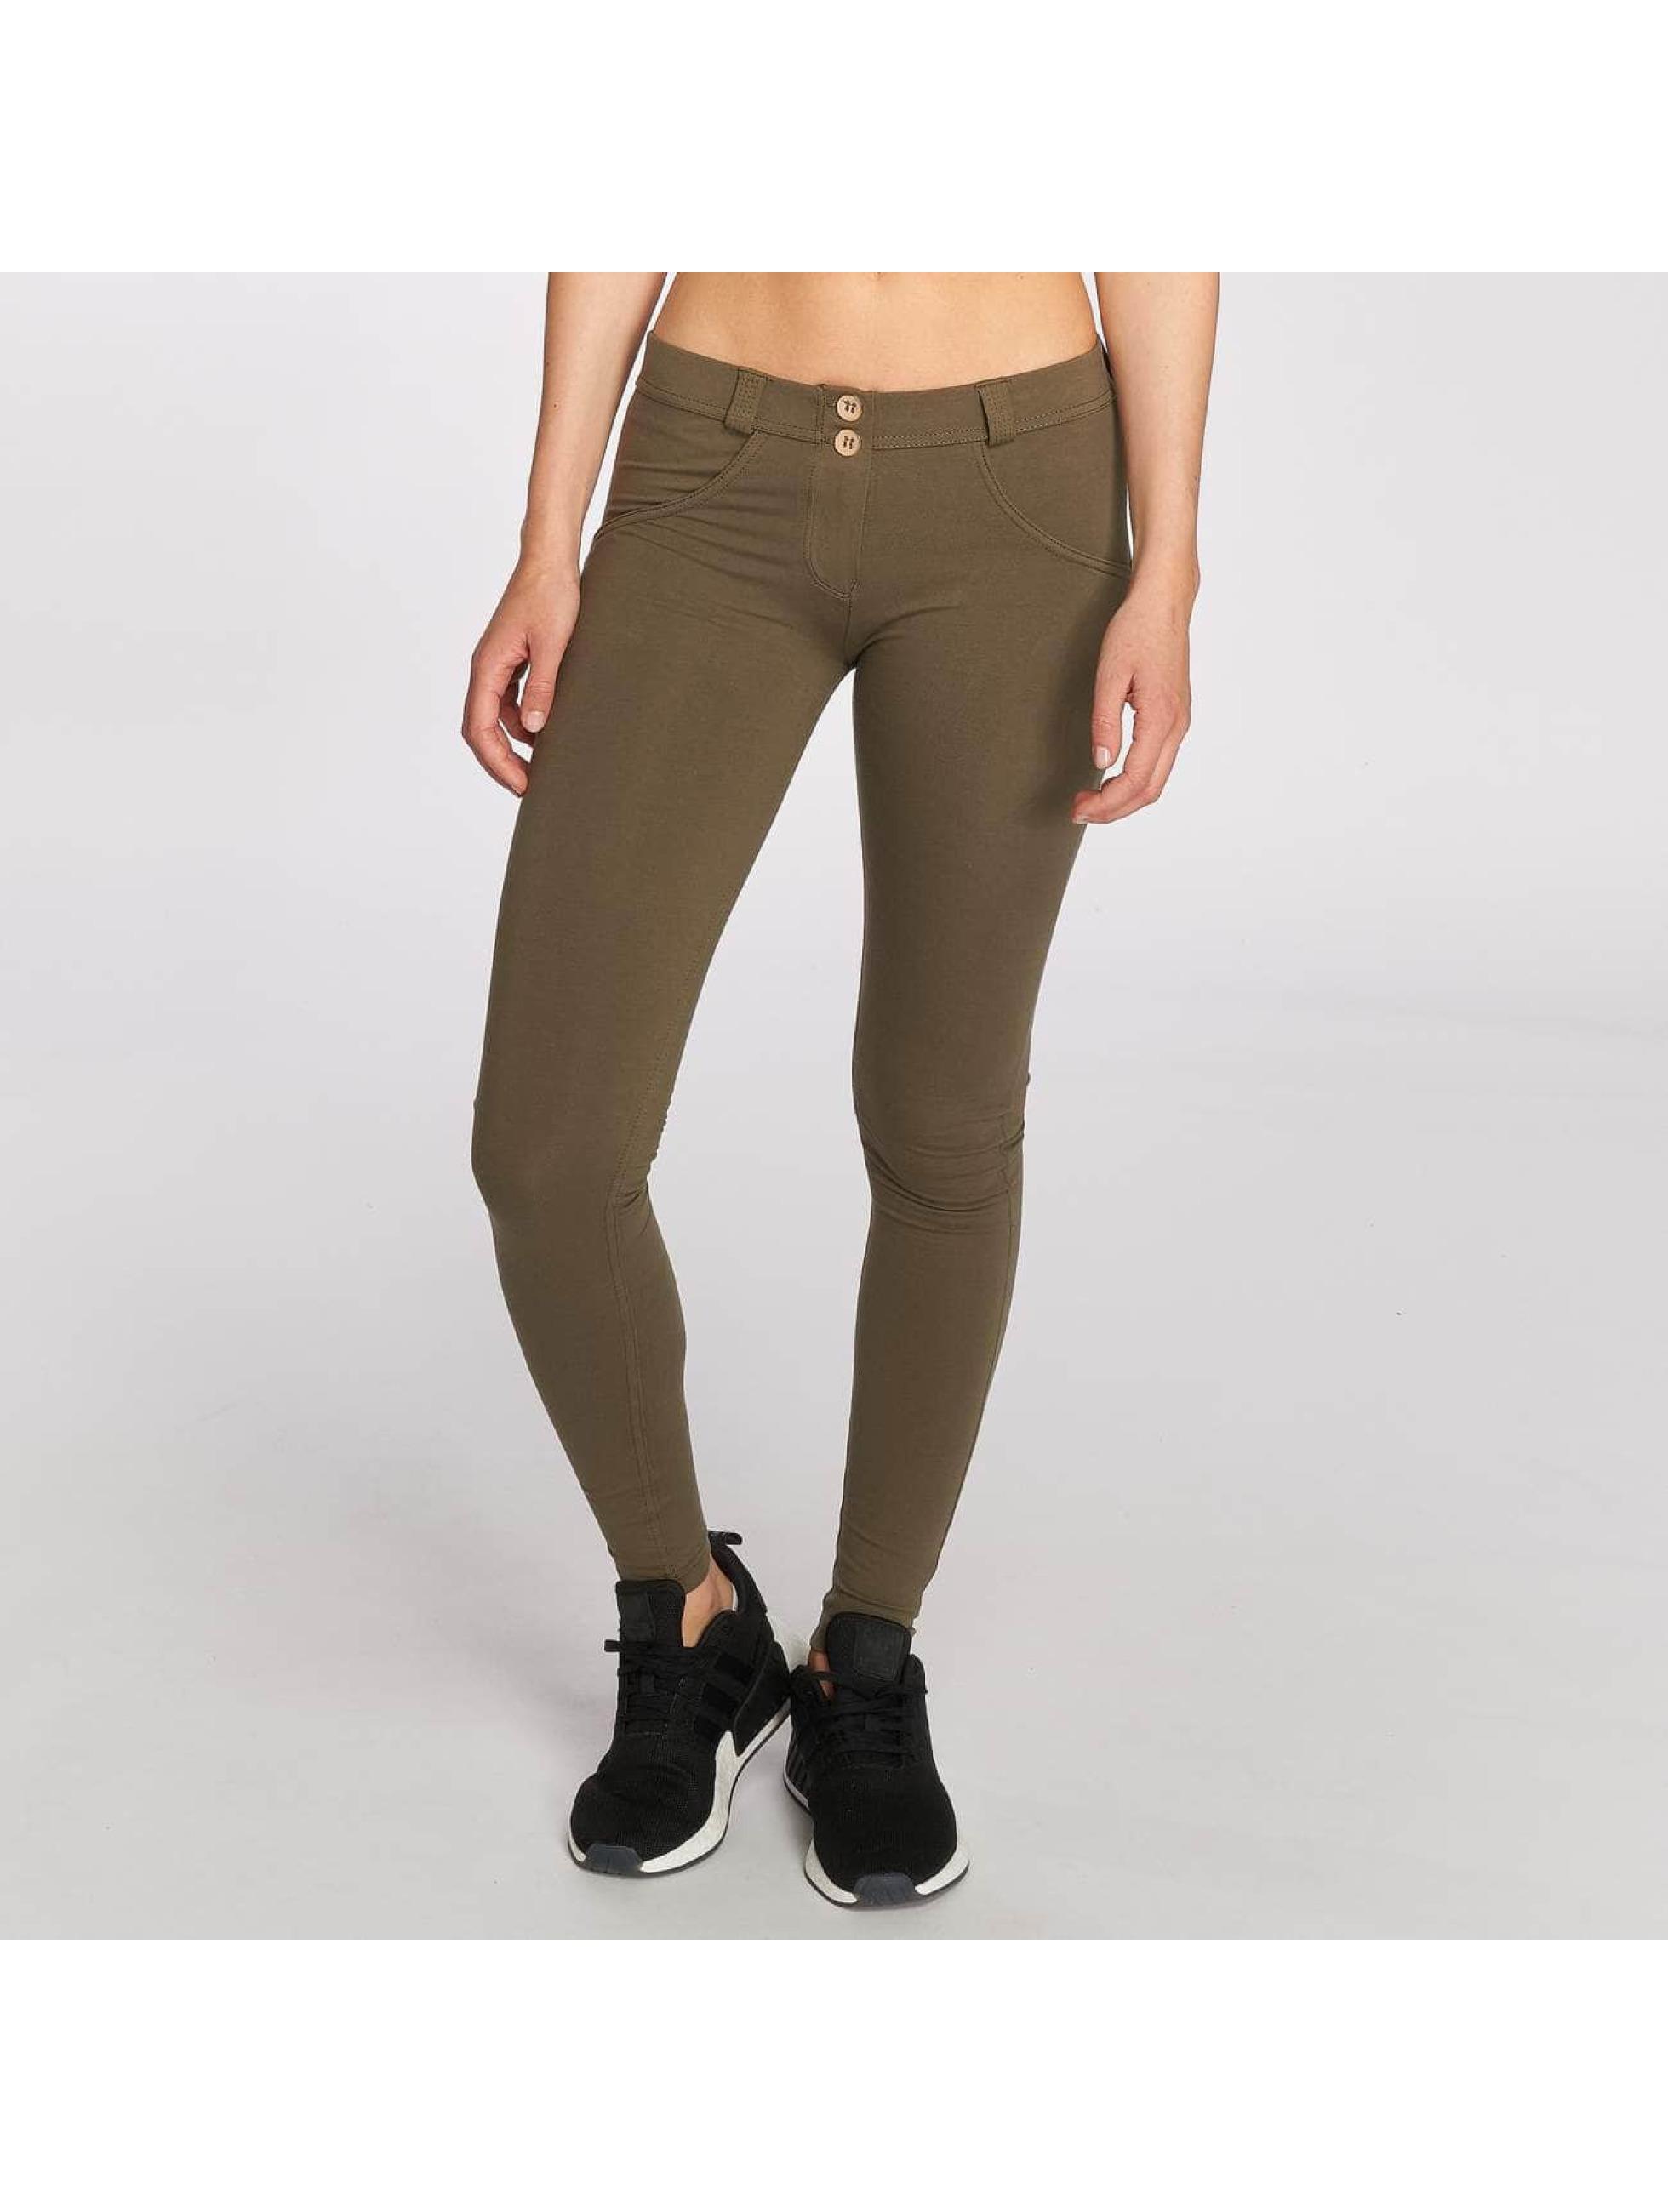 Freddy Jeans slim fit Pantalone Lunga oliva